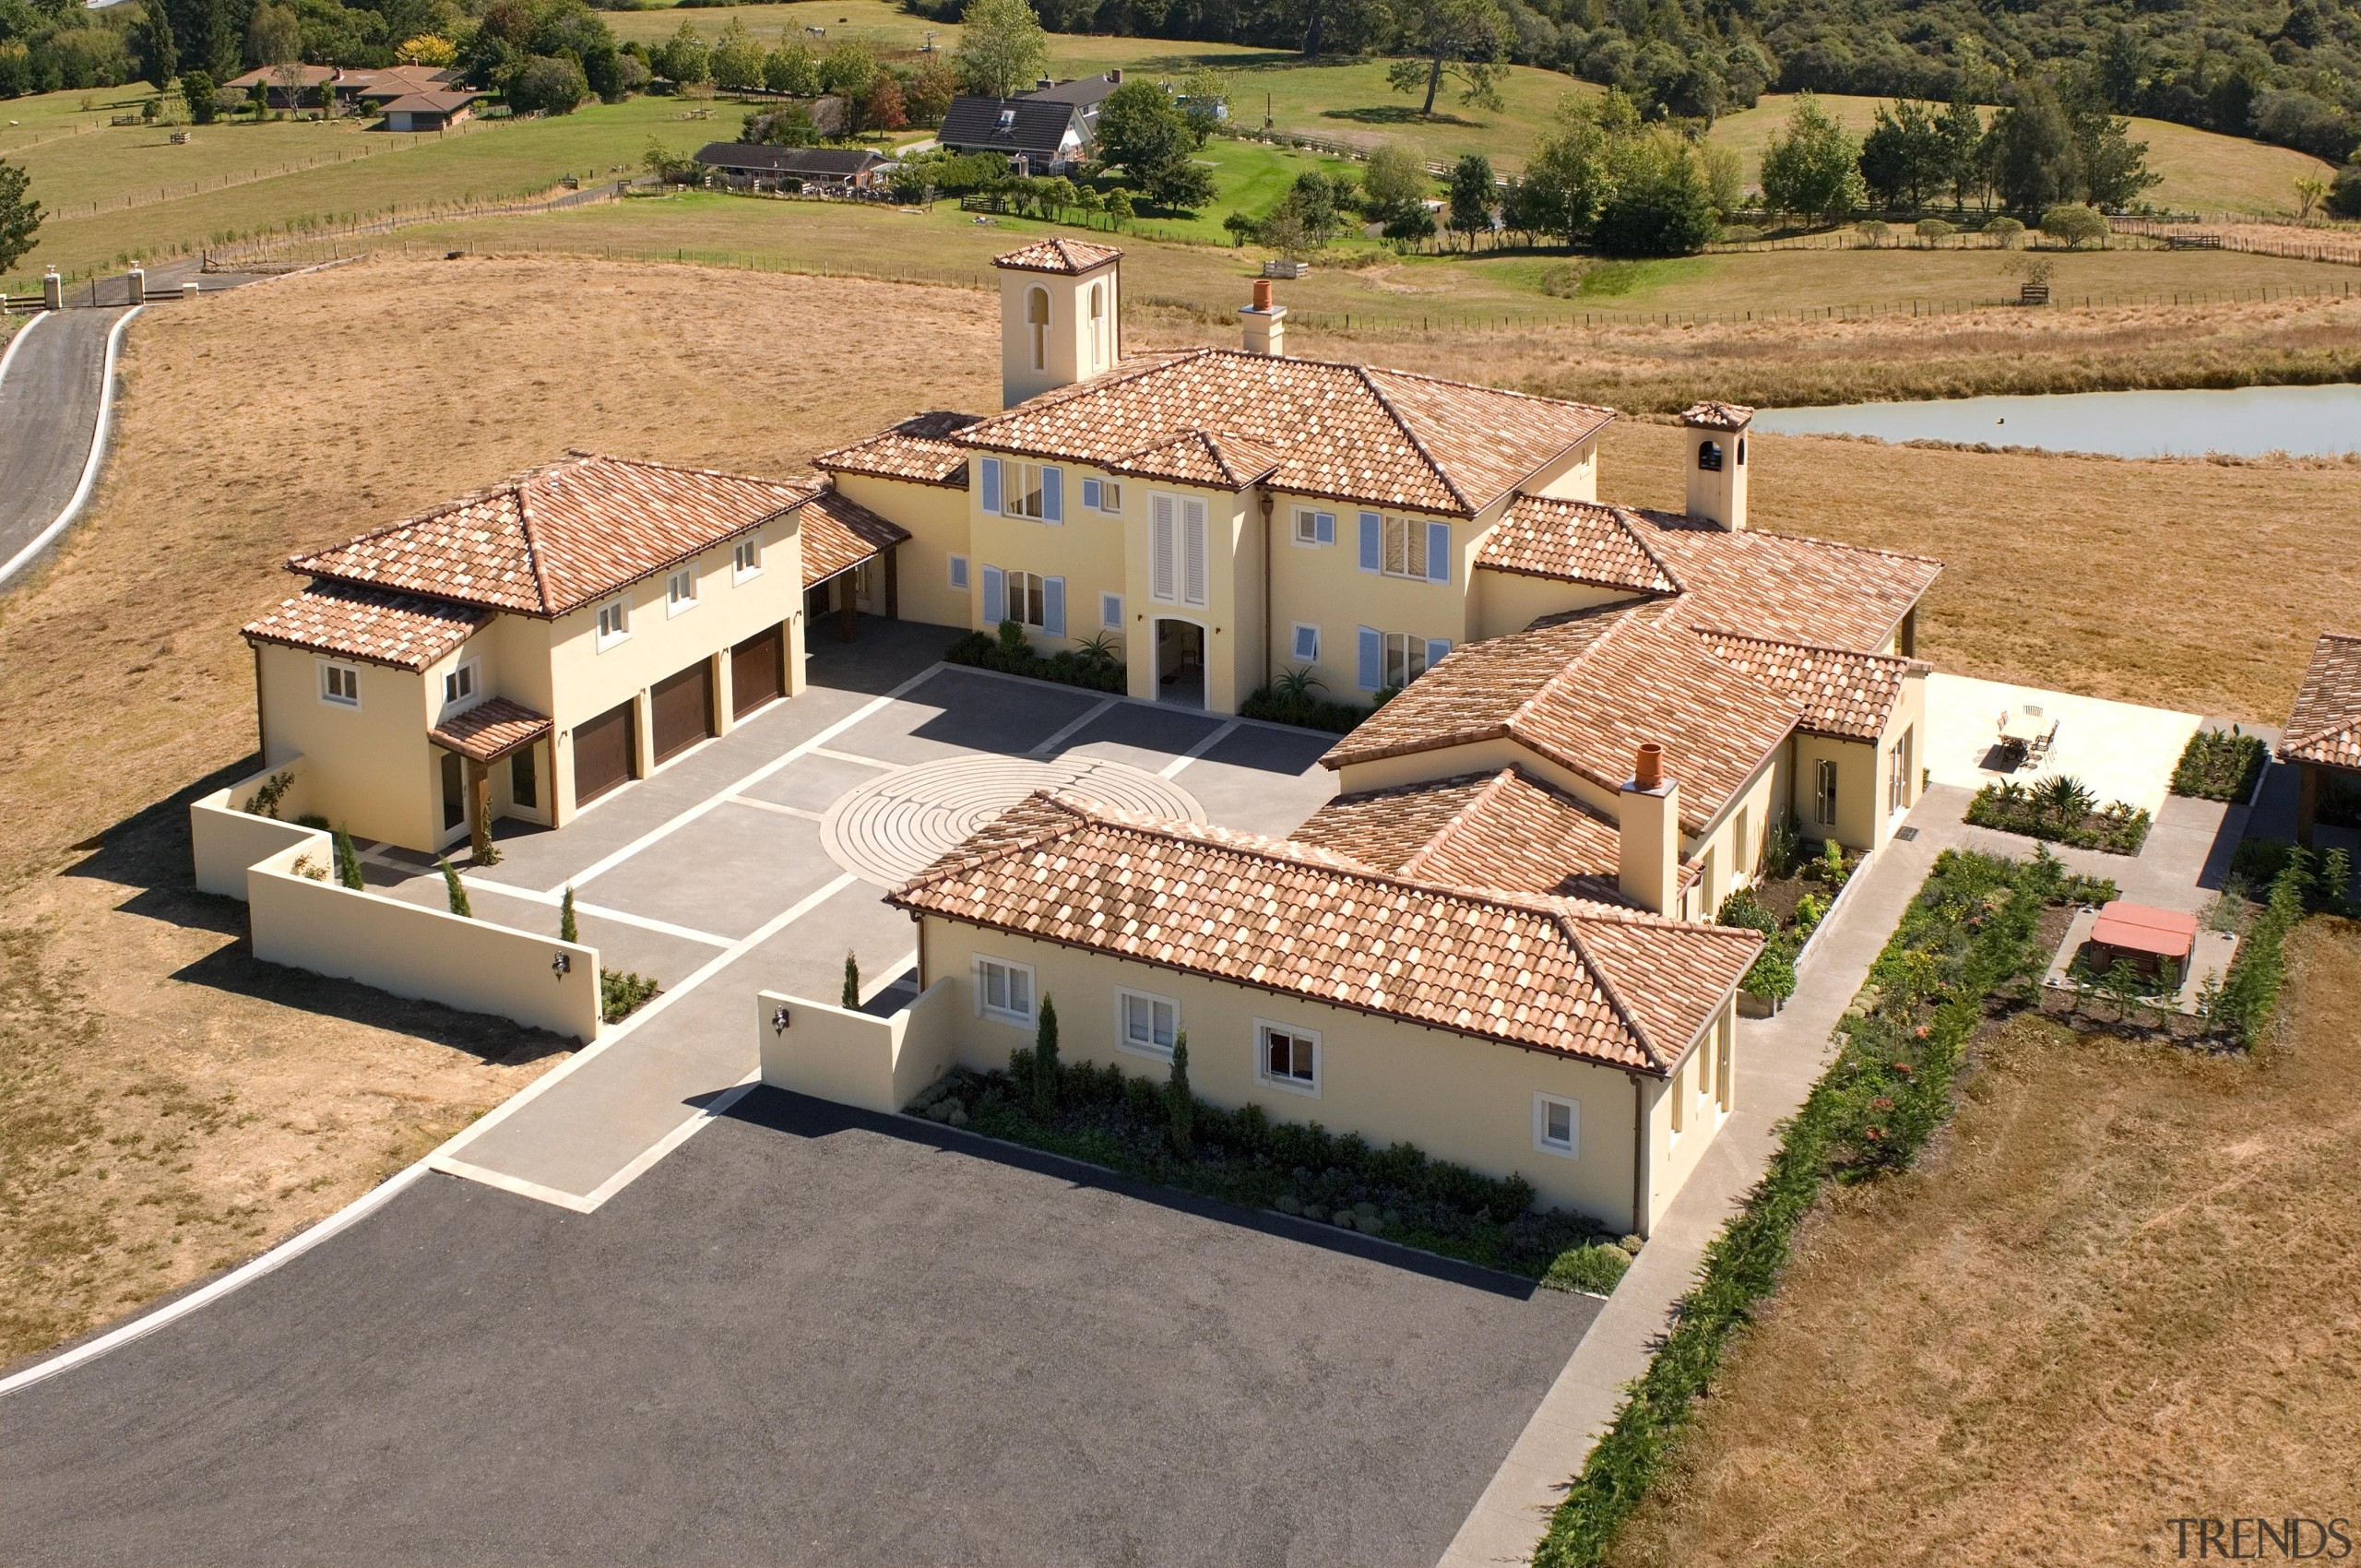 134 mahoenui 4 - Mahoenui 4 - estate estate, home, house, mansion, property, real estate, residential area, roof, villa, orange, brown